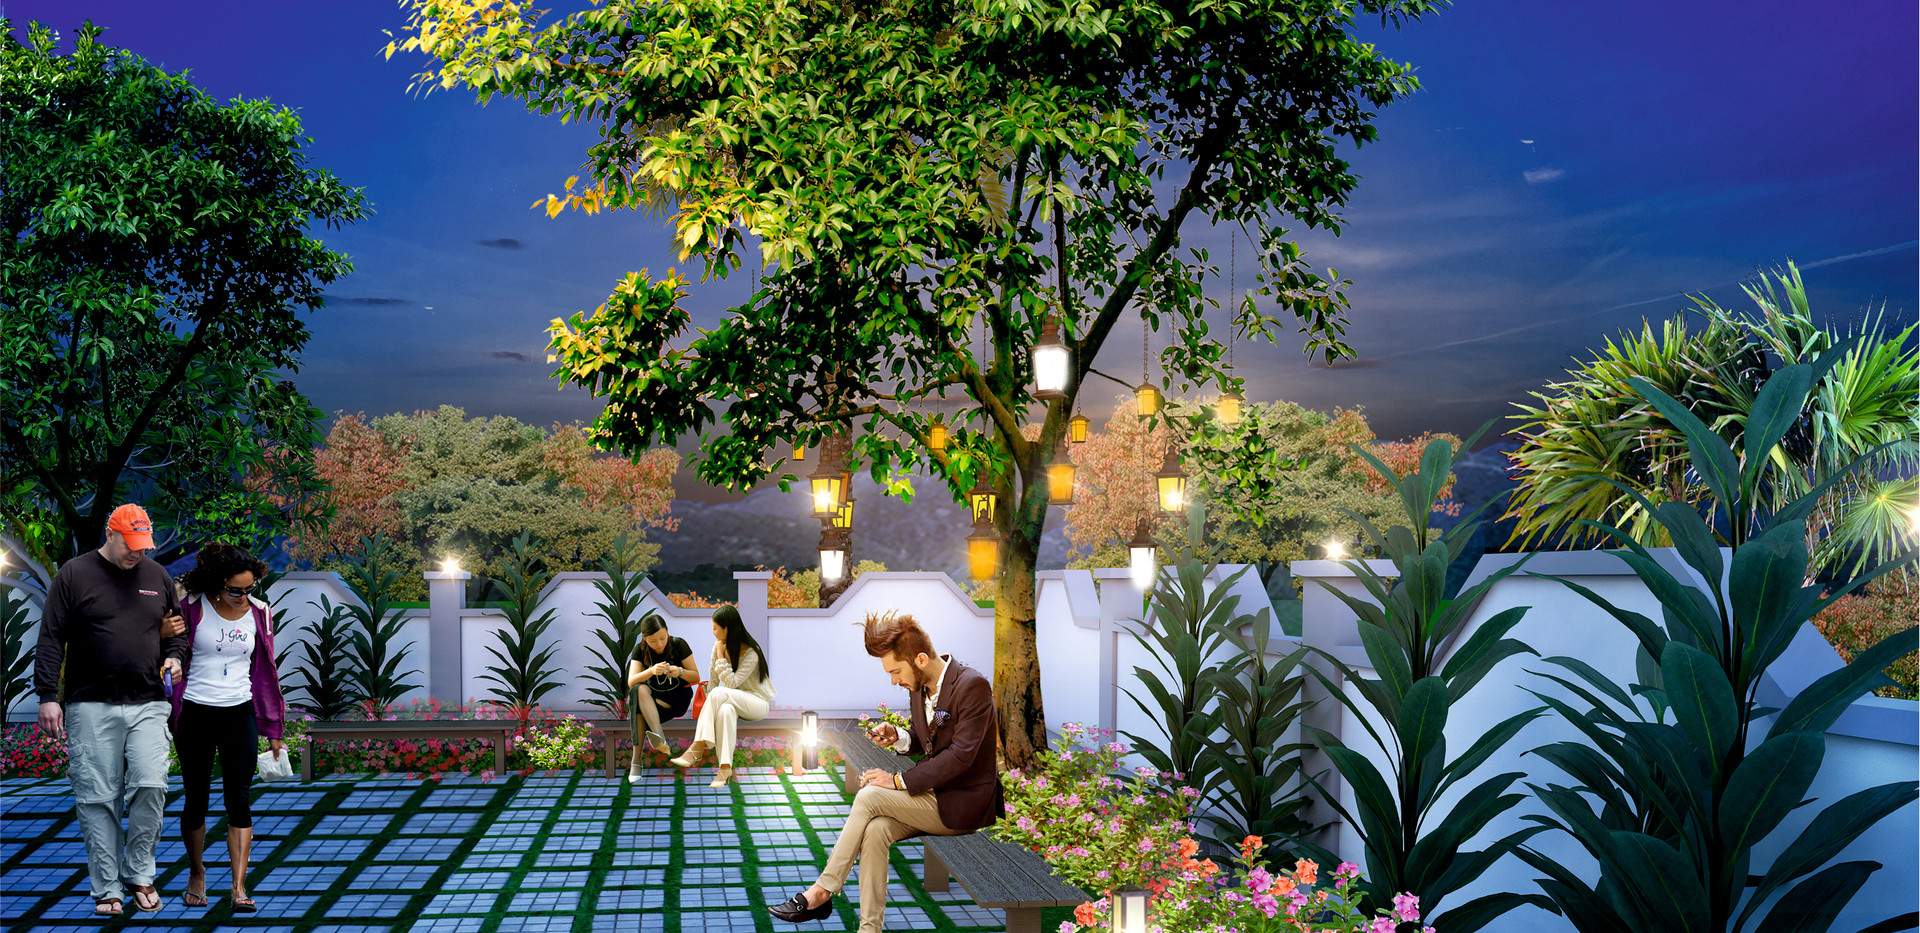 Yash Florencia lantern Garden View